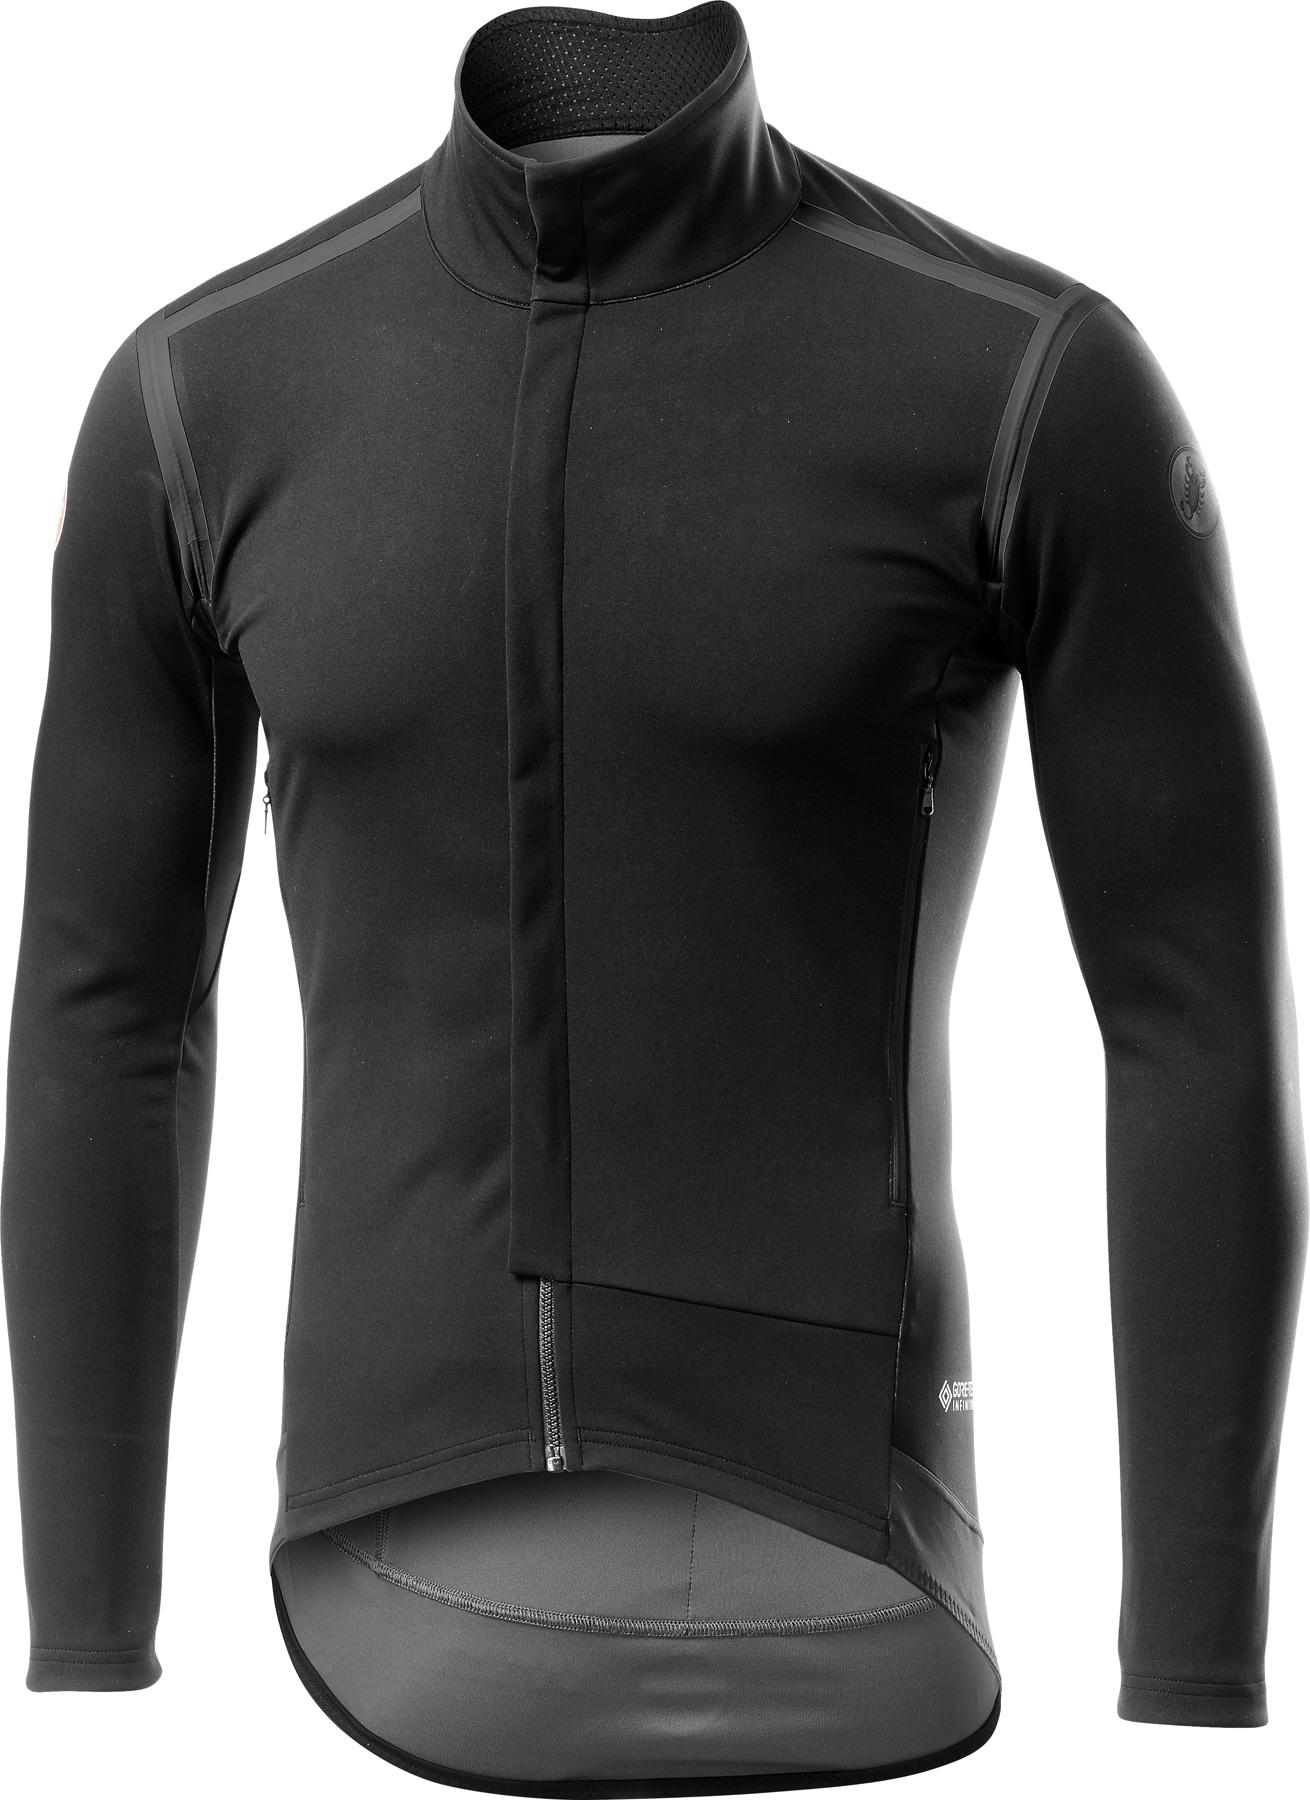 Produktbild von Castelli Perfetto RoS Long Sleeve Jacke - black out 710